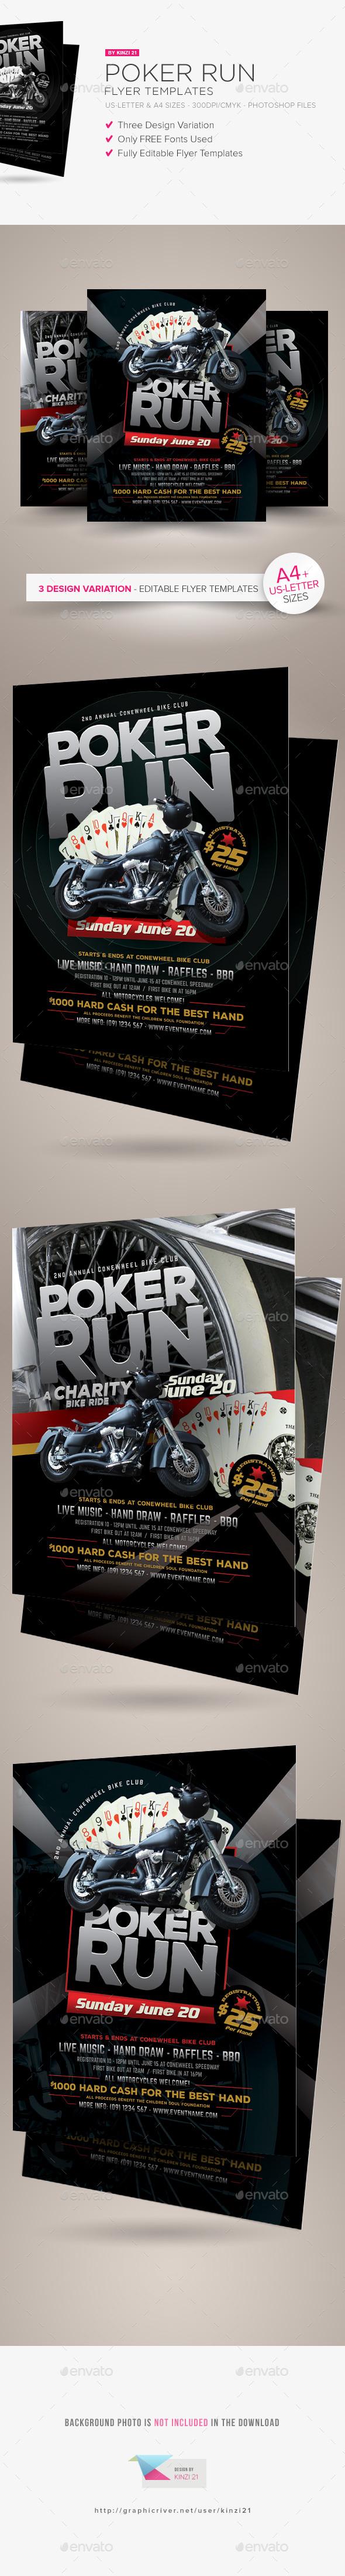 Poker Run Flyer Templates